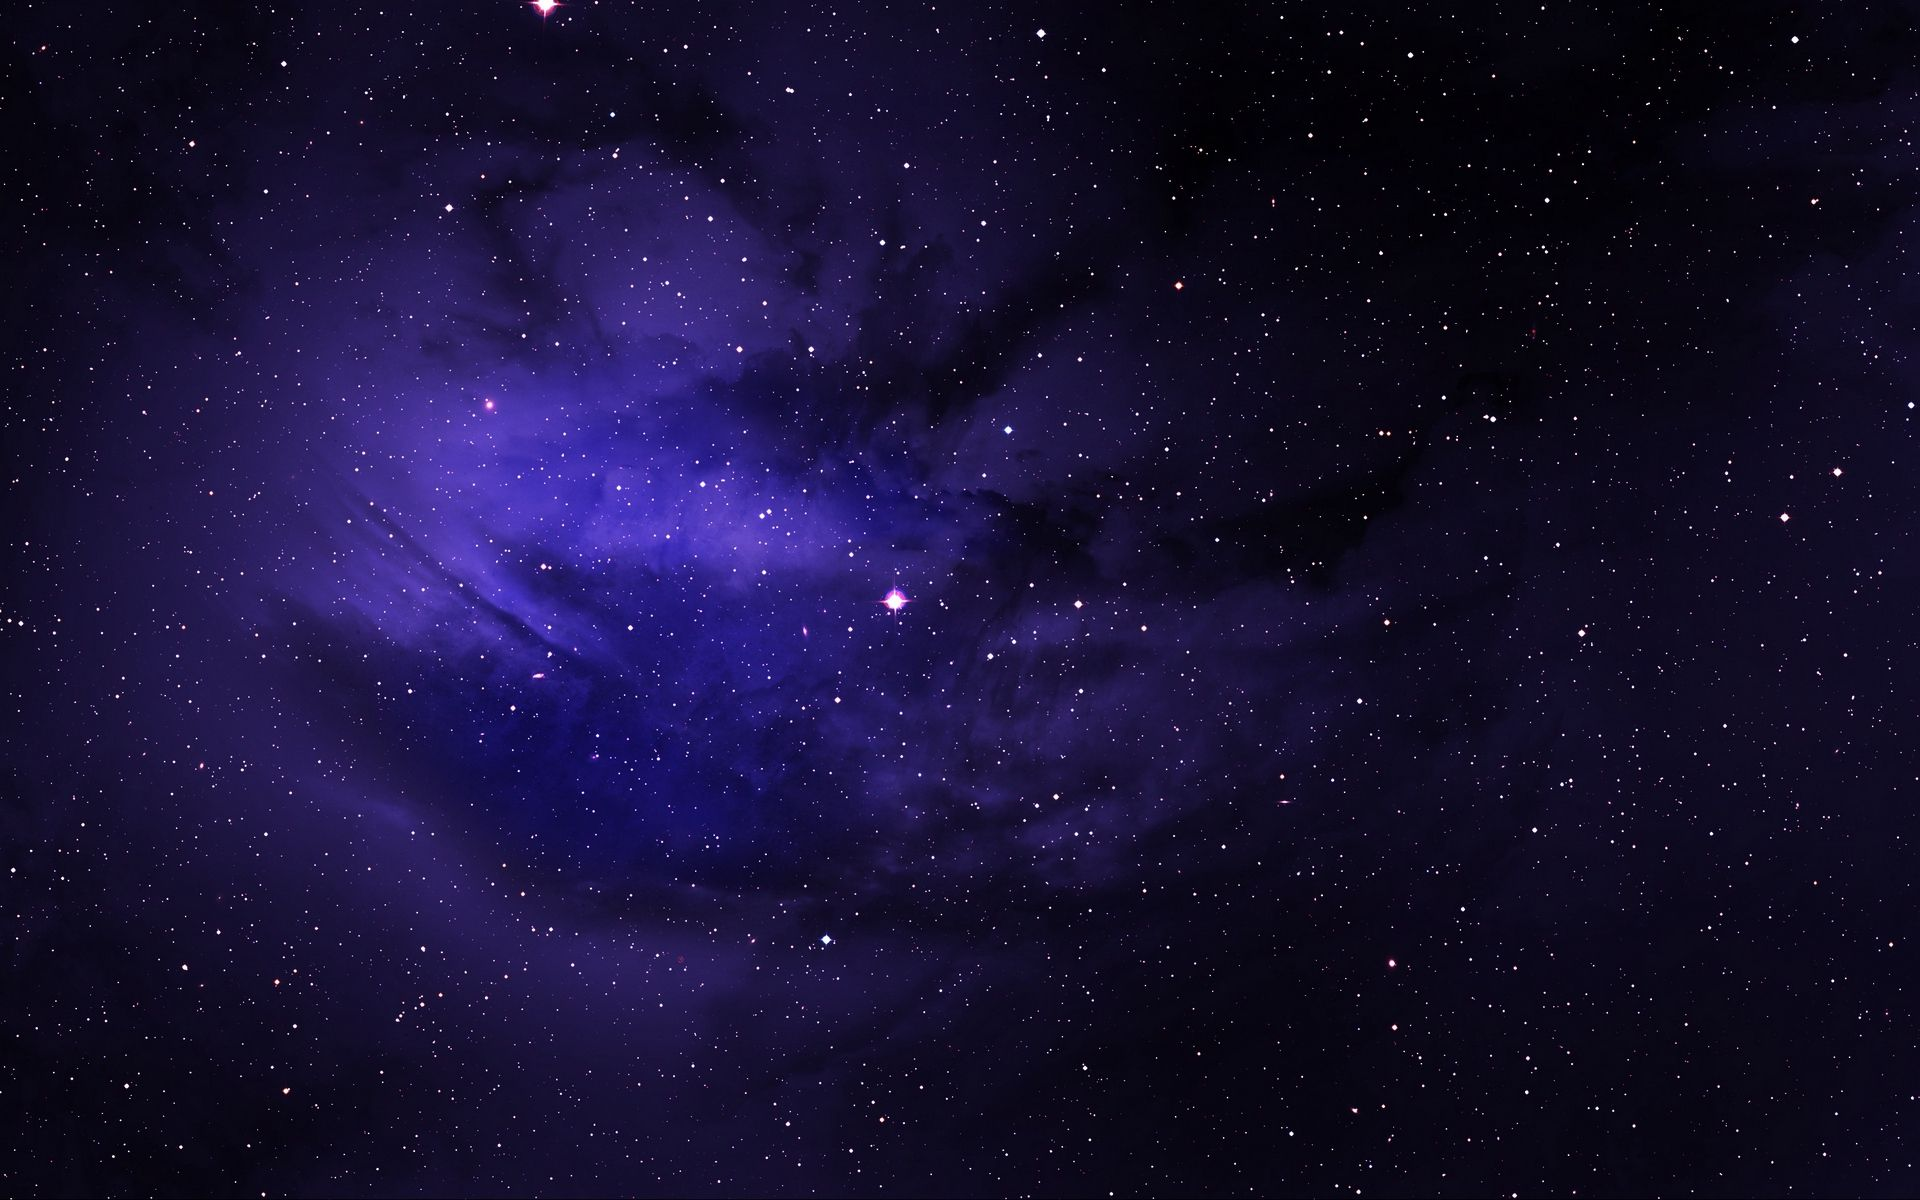 Dark Space Wallpaper Hd Galaxy Wallpaper Galaxy Galaxy Tablet